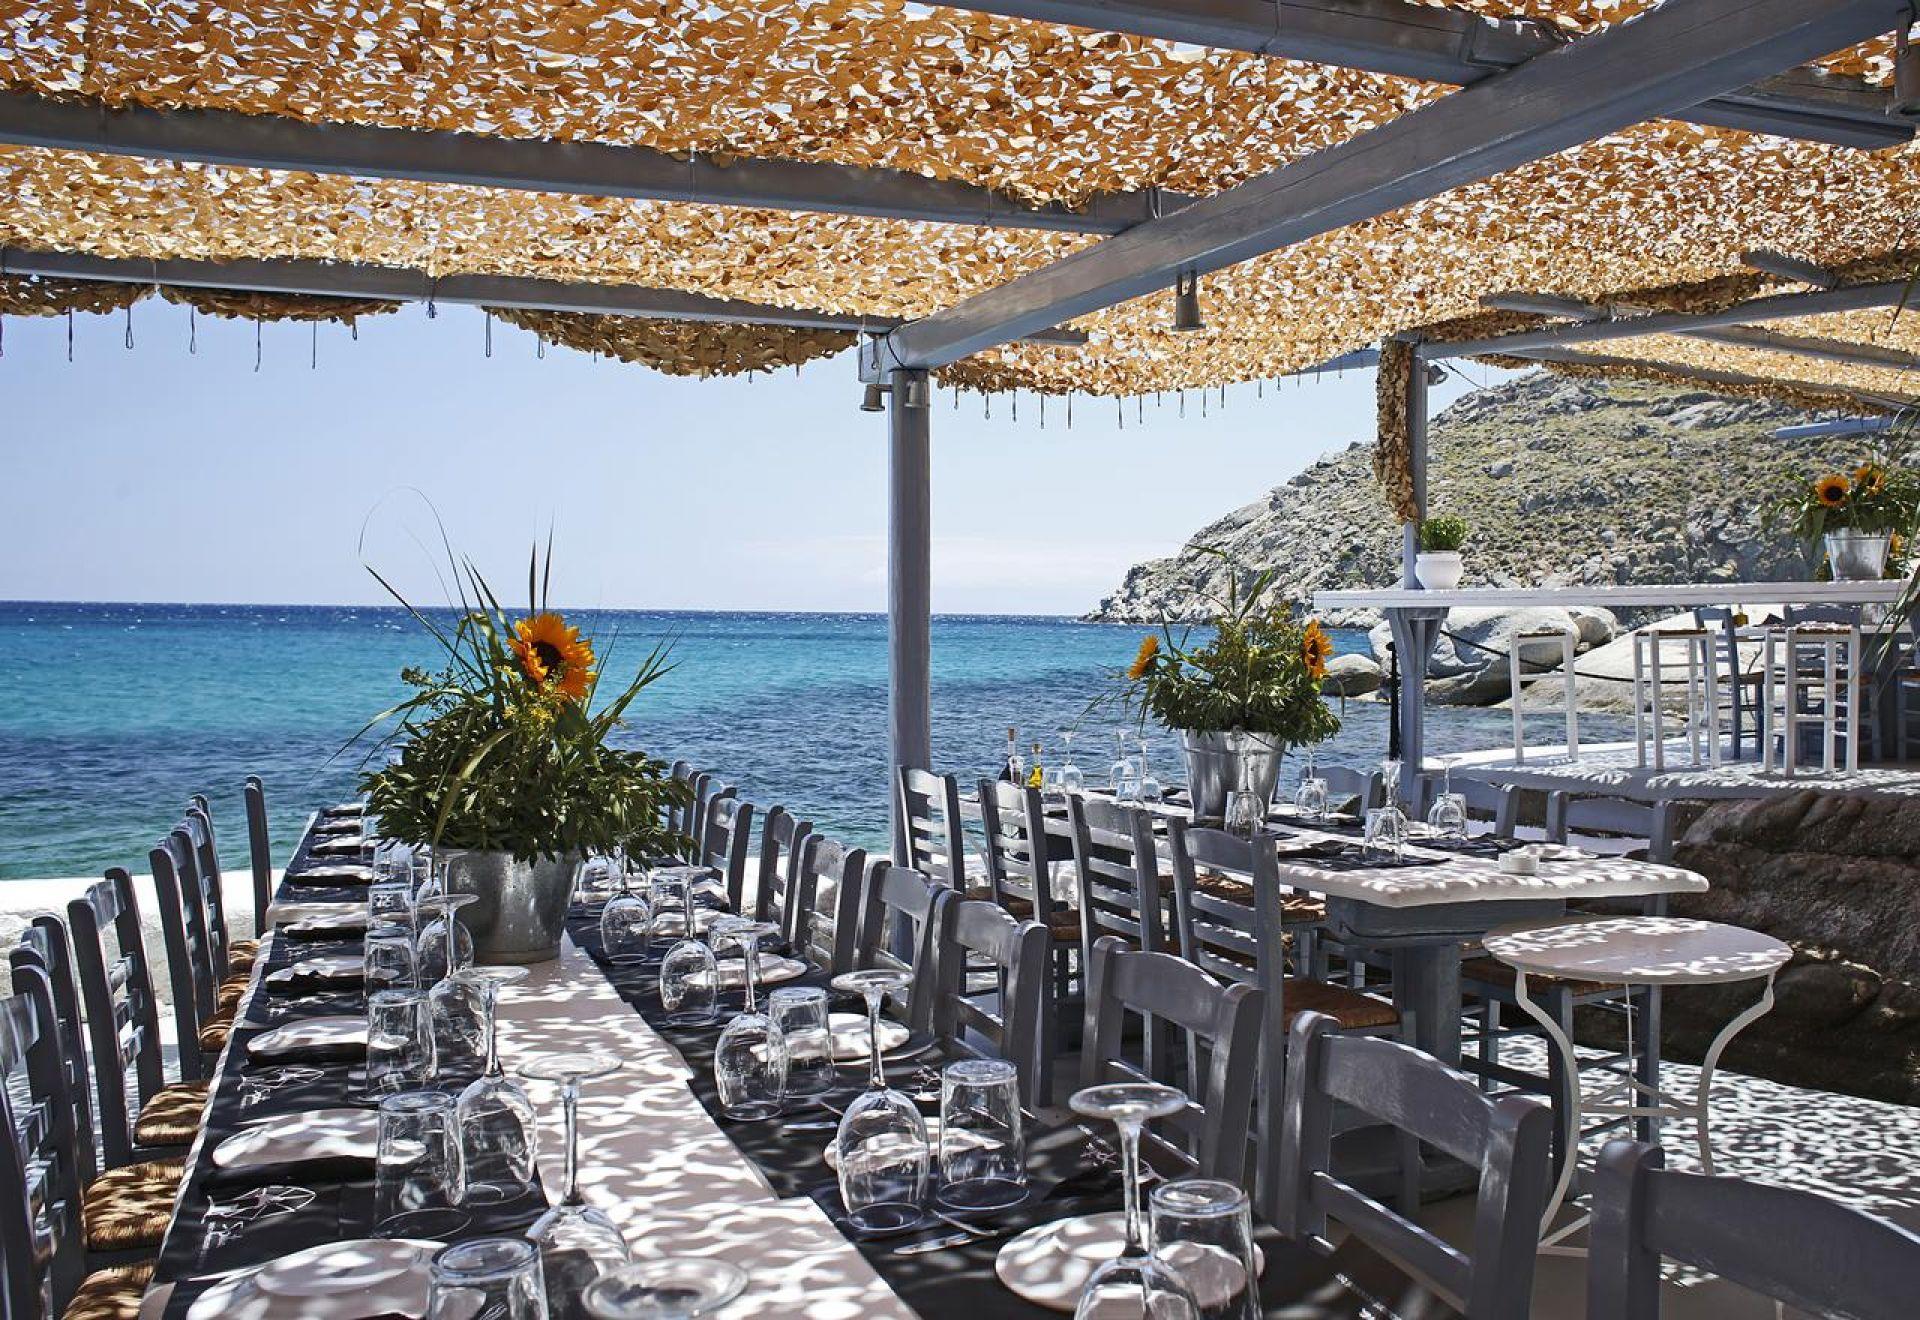 Spilia Tavern